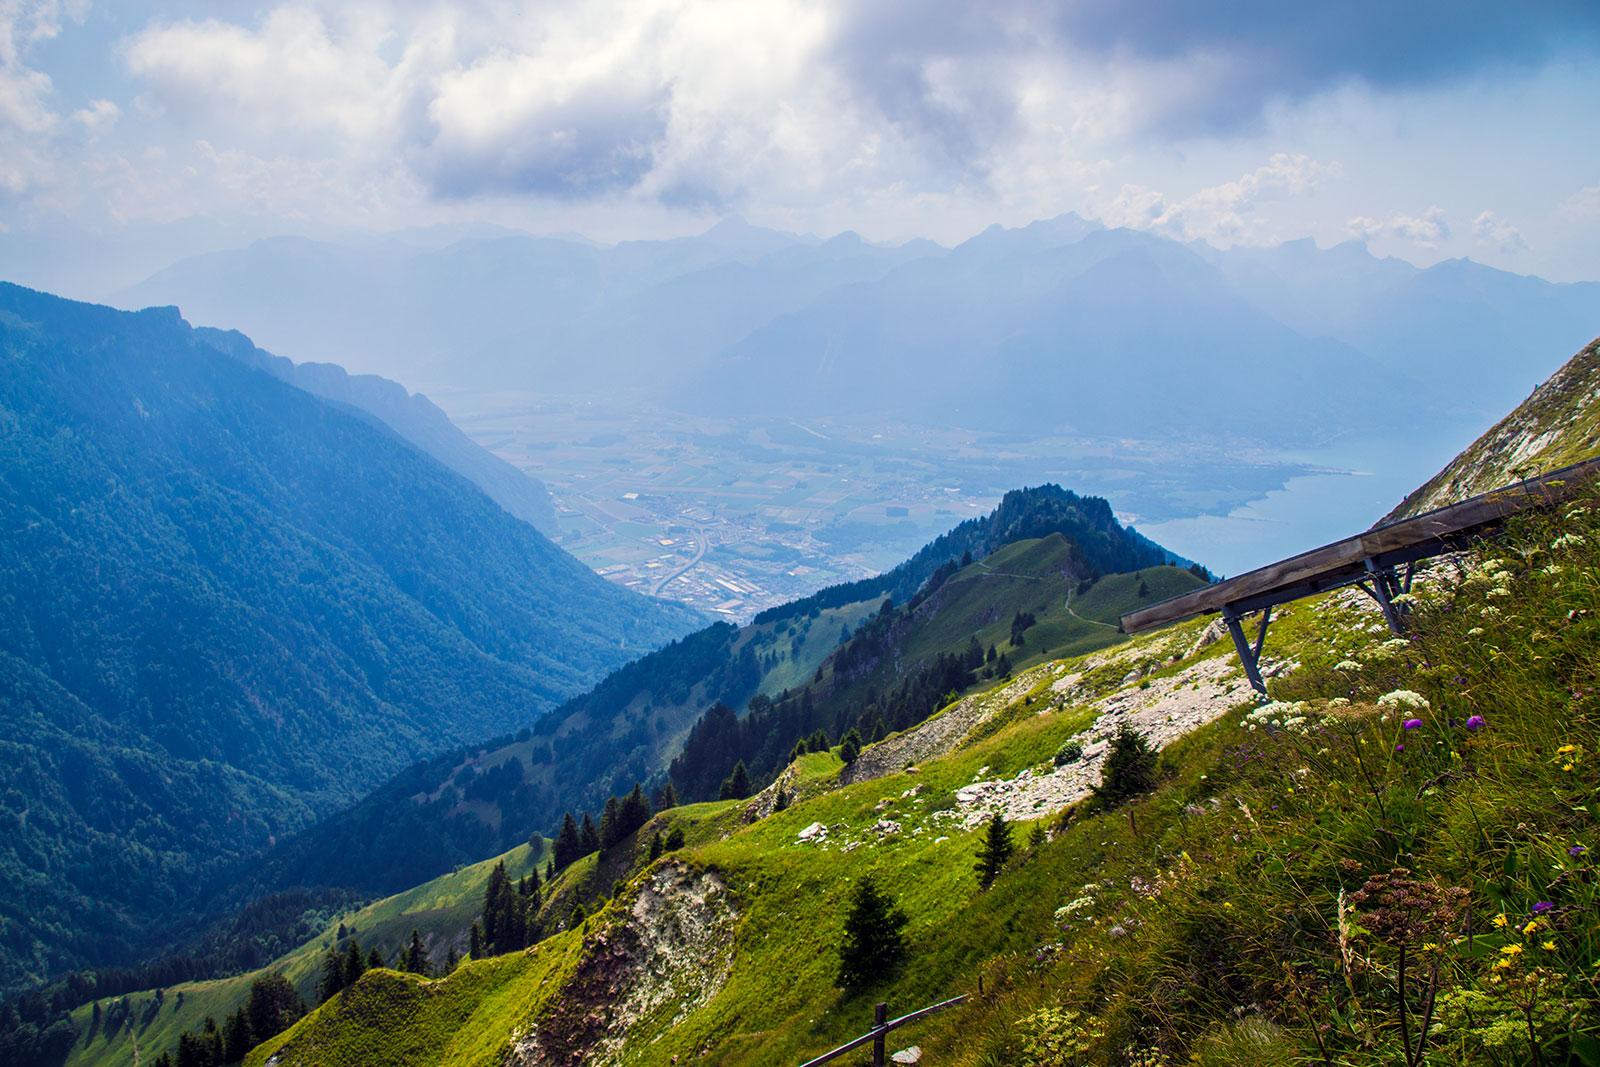 Rochers de Naye 2 - Montreux la joya del lago Lemán